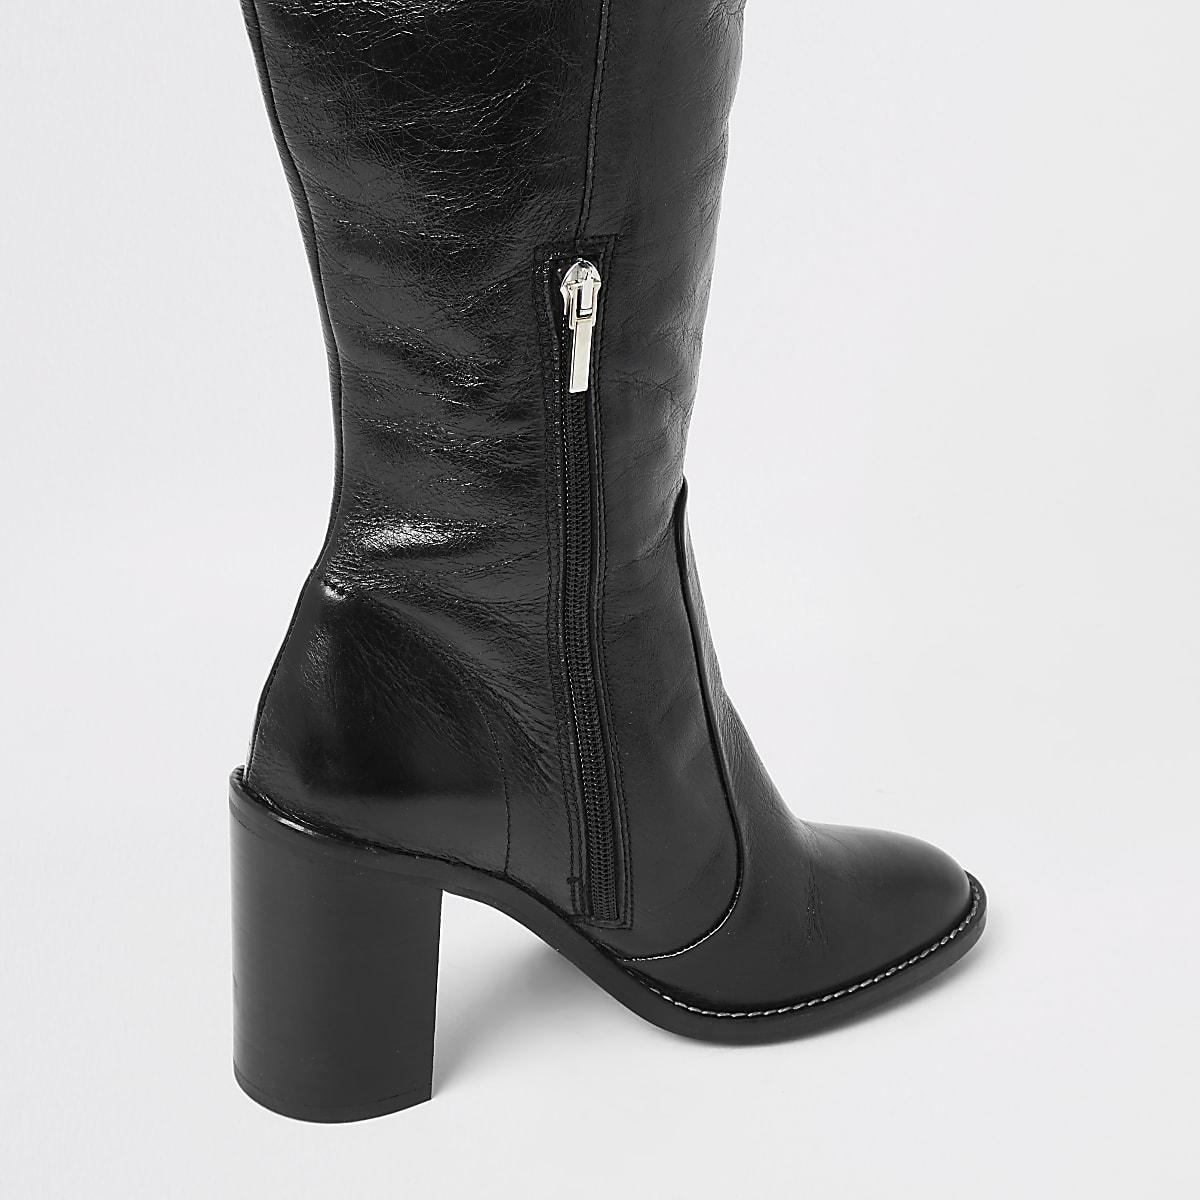 b01401ee395 Black leather block heel knee high boots